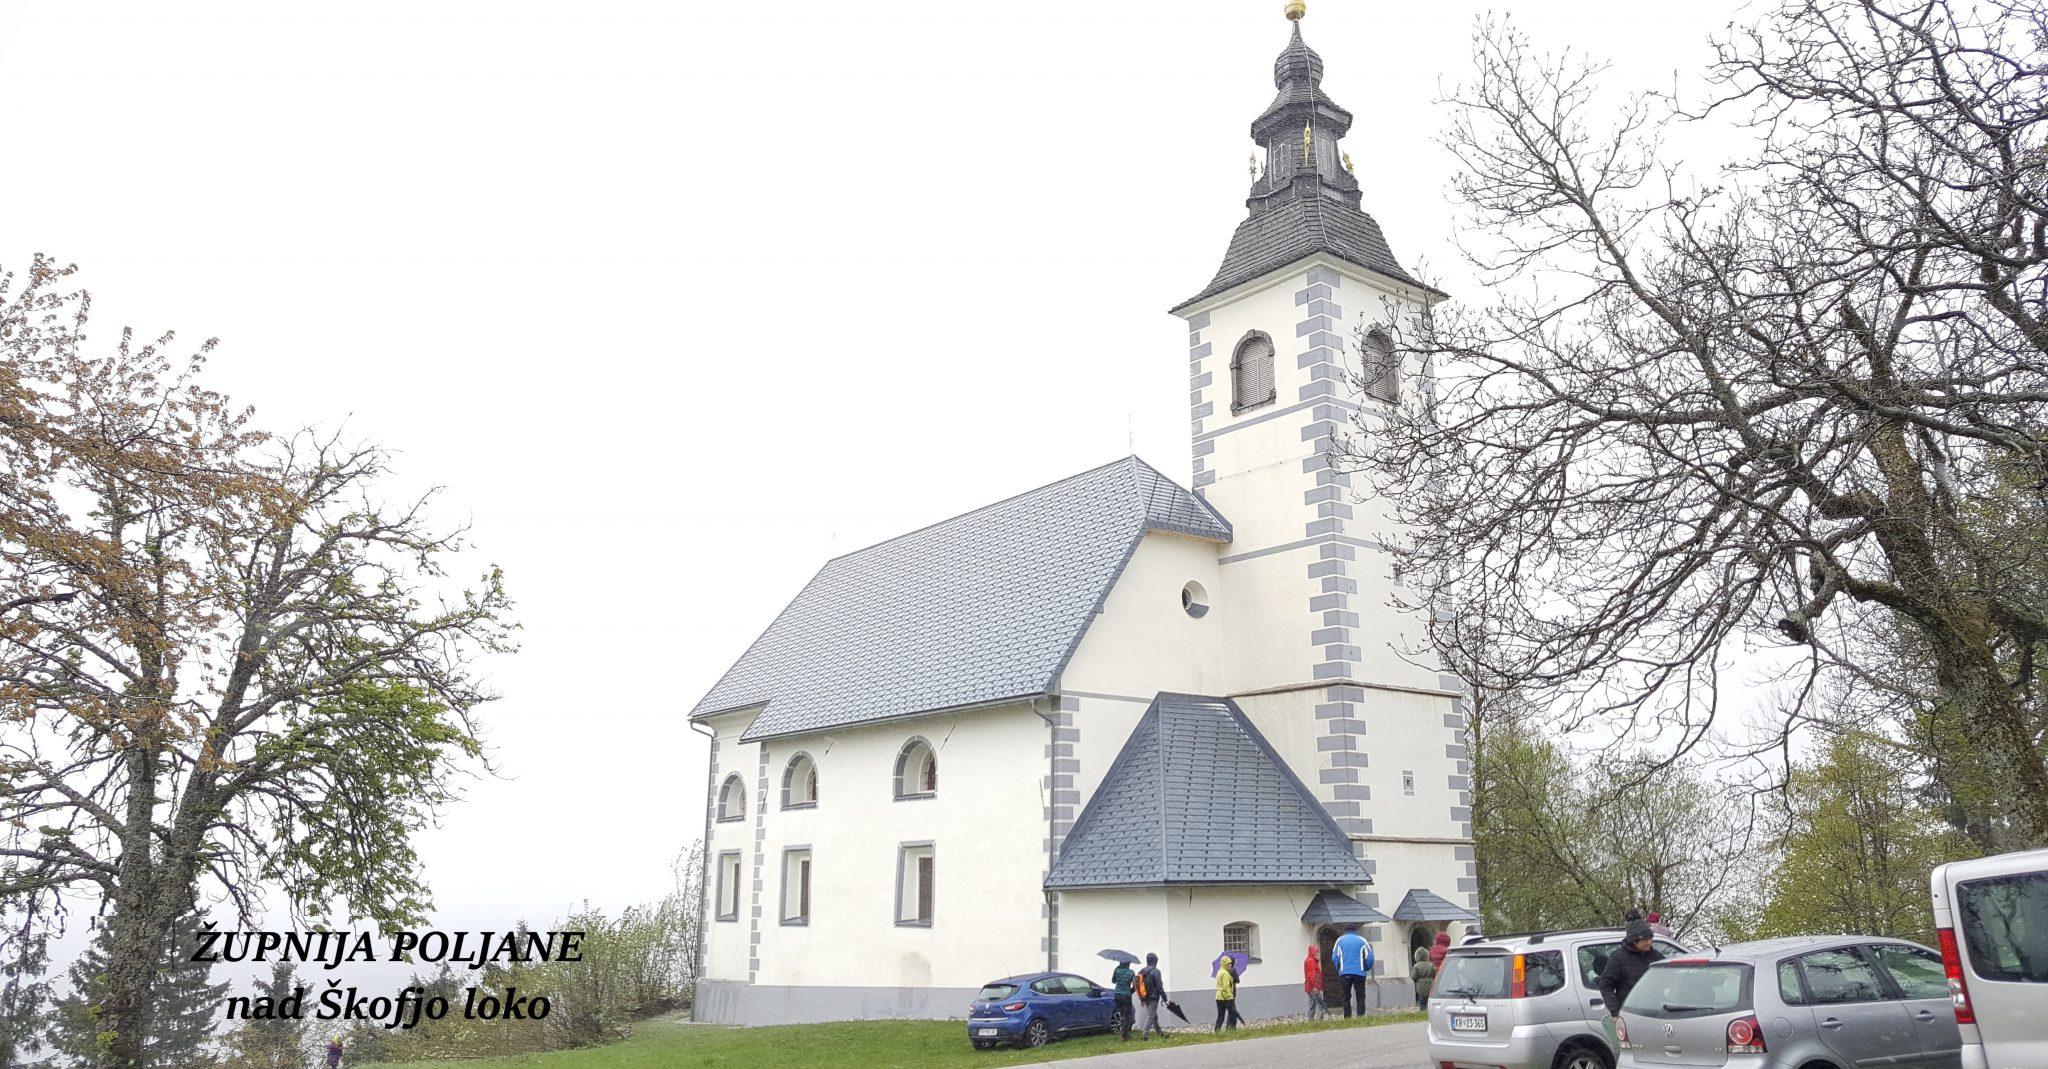 Župnija Poljane